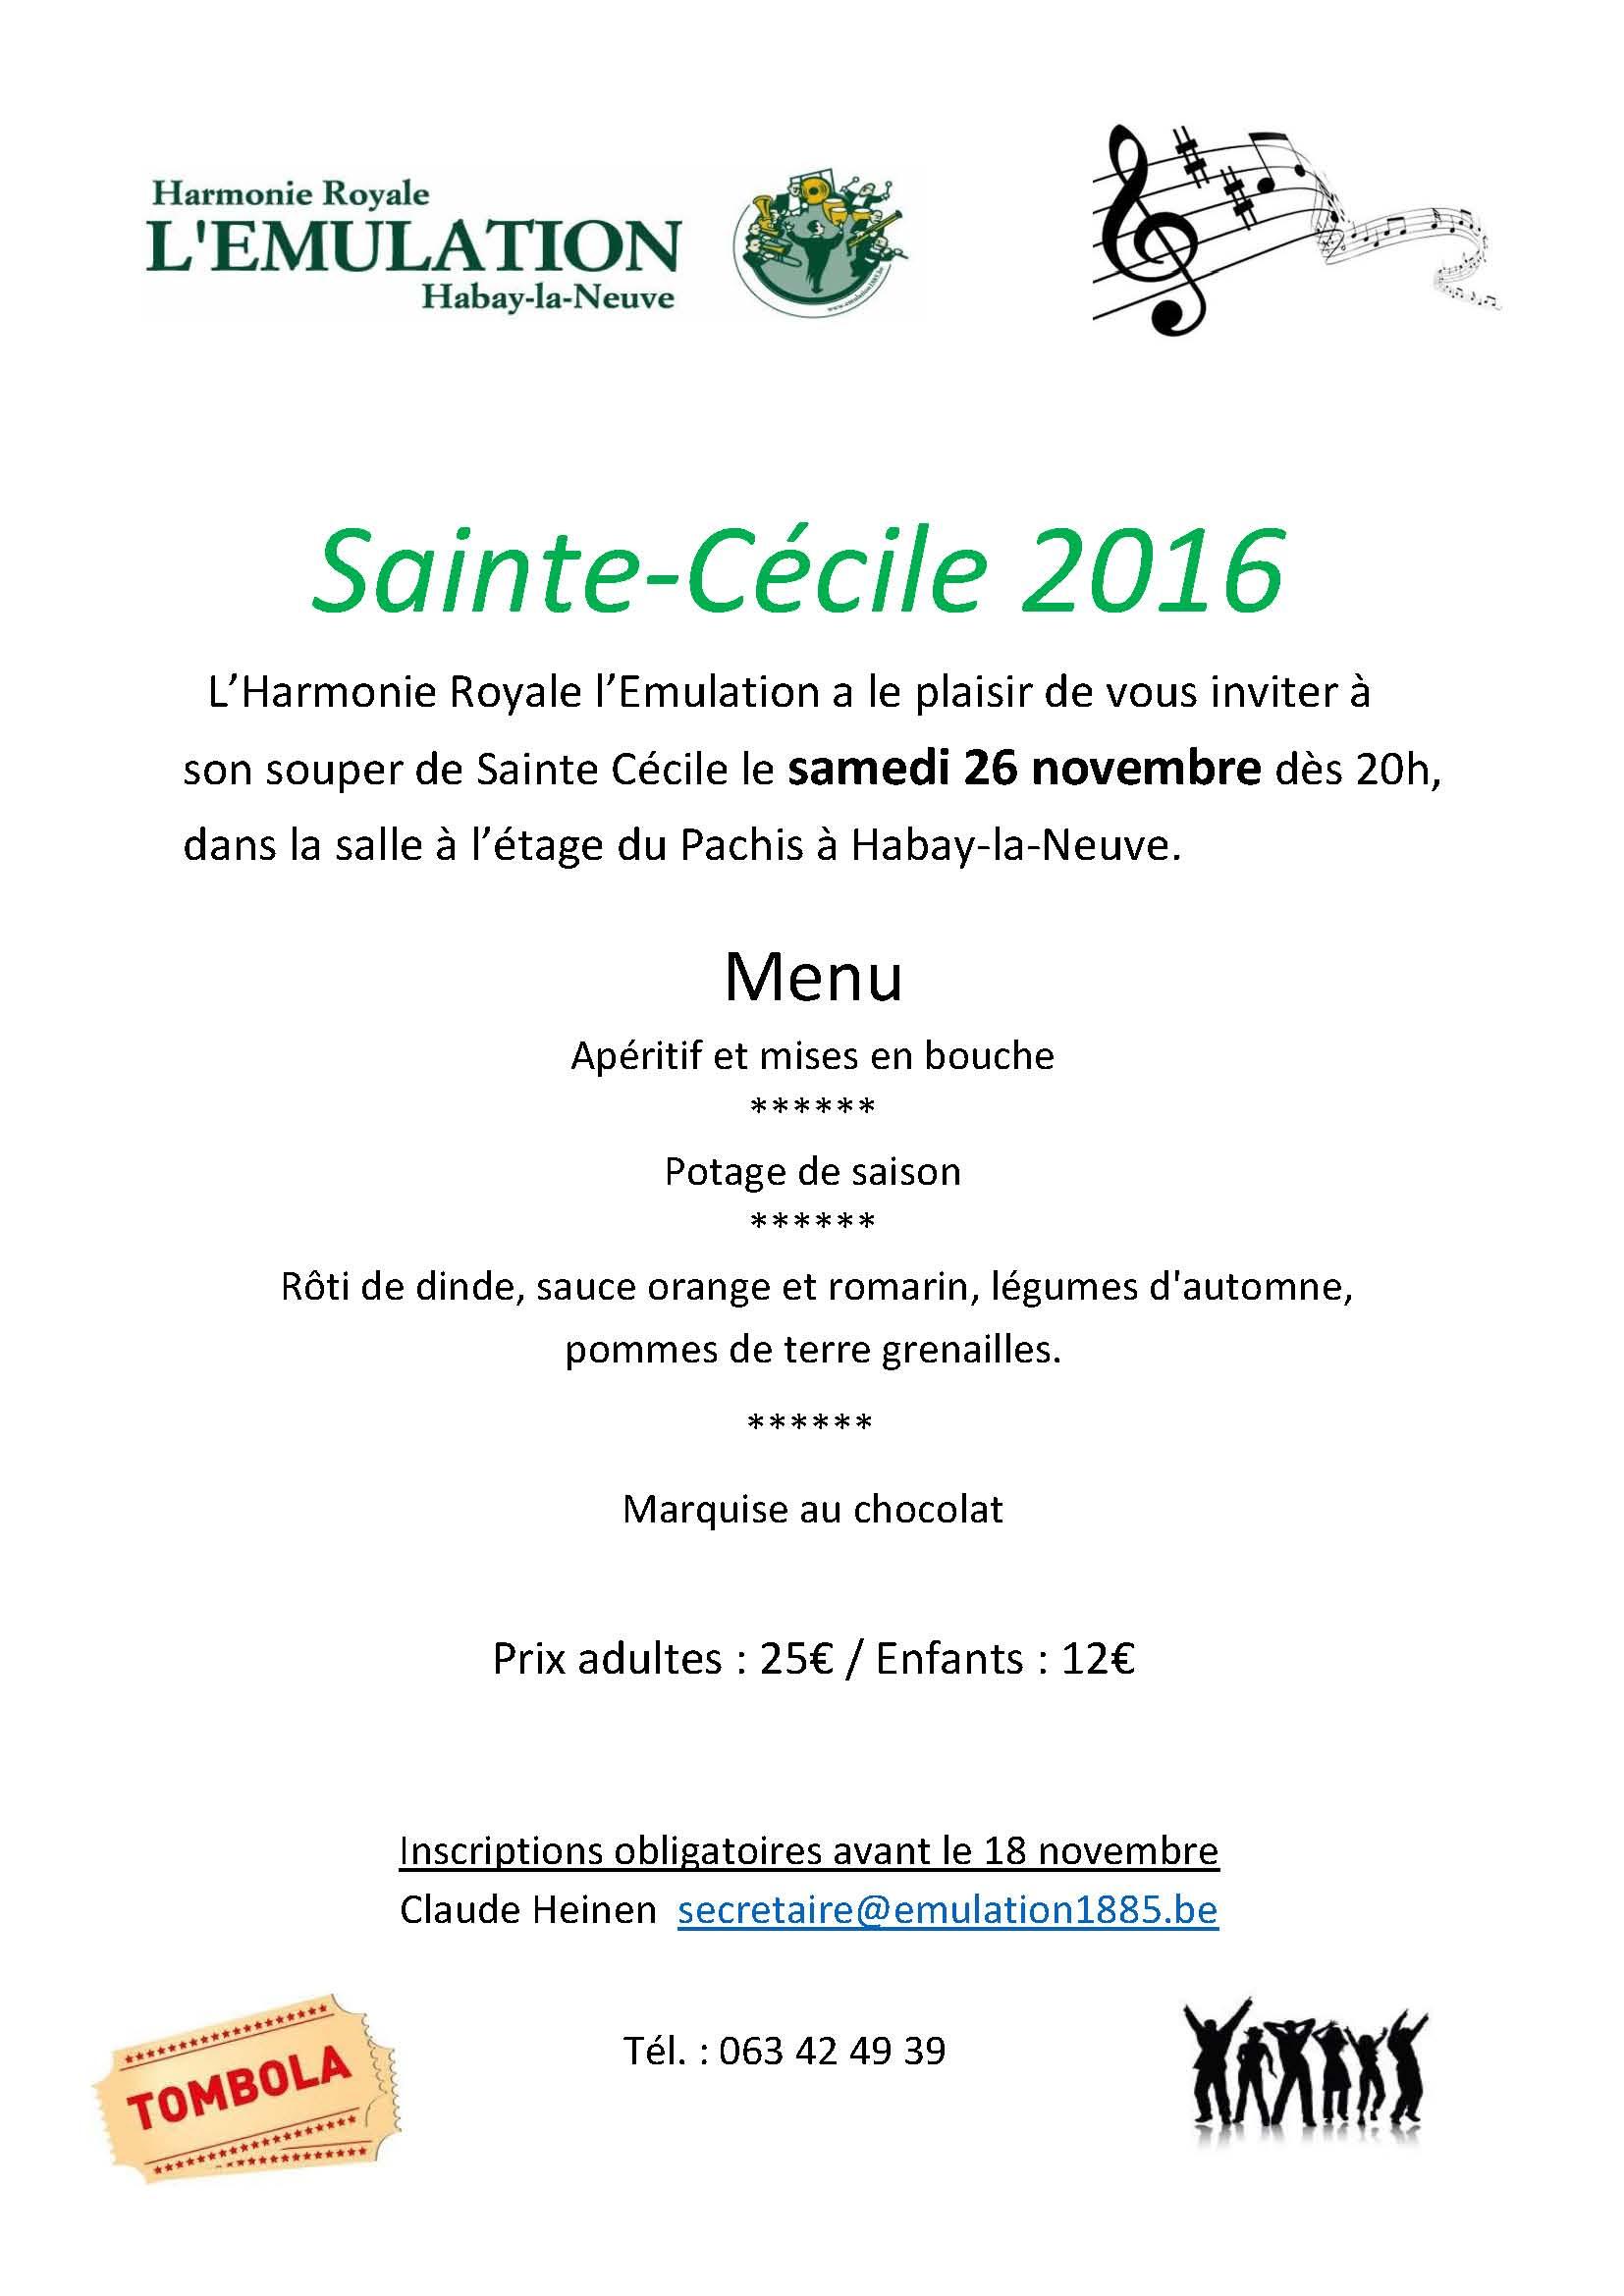 affiche-sainte-cecile-2016-copie